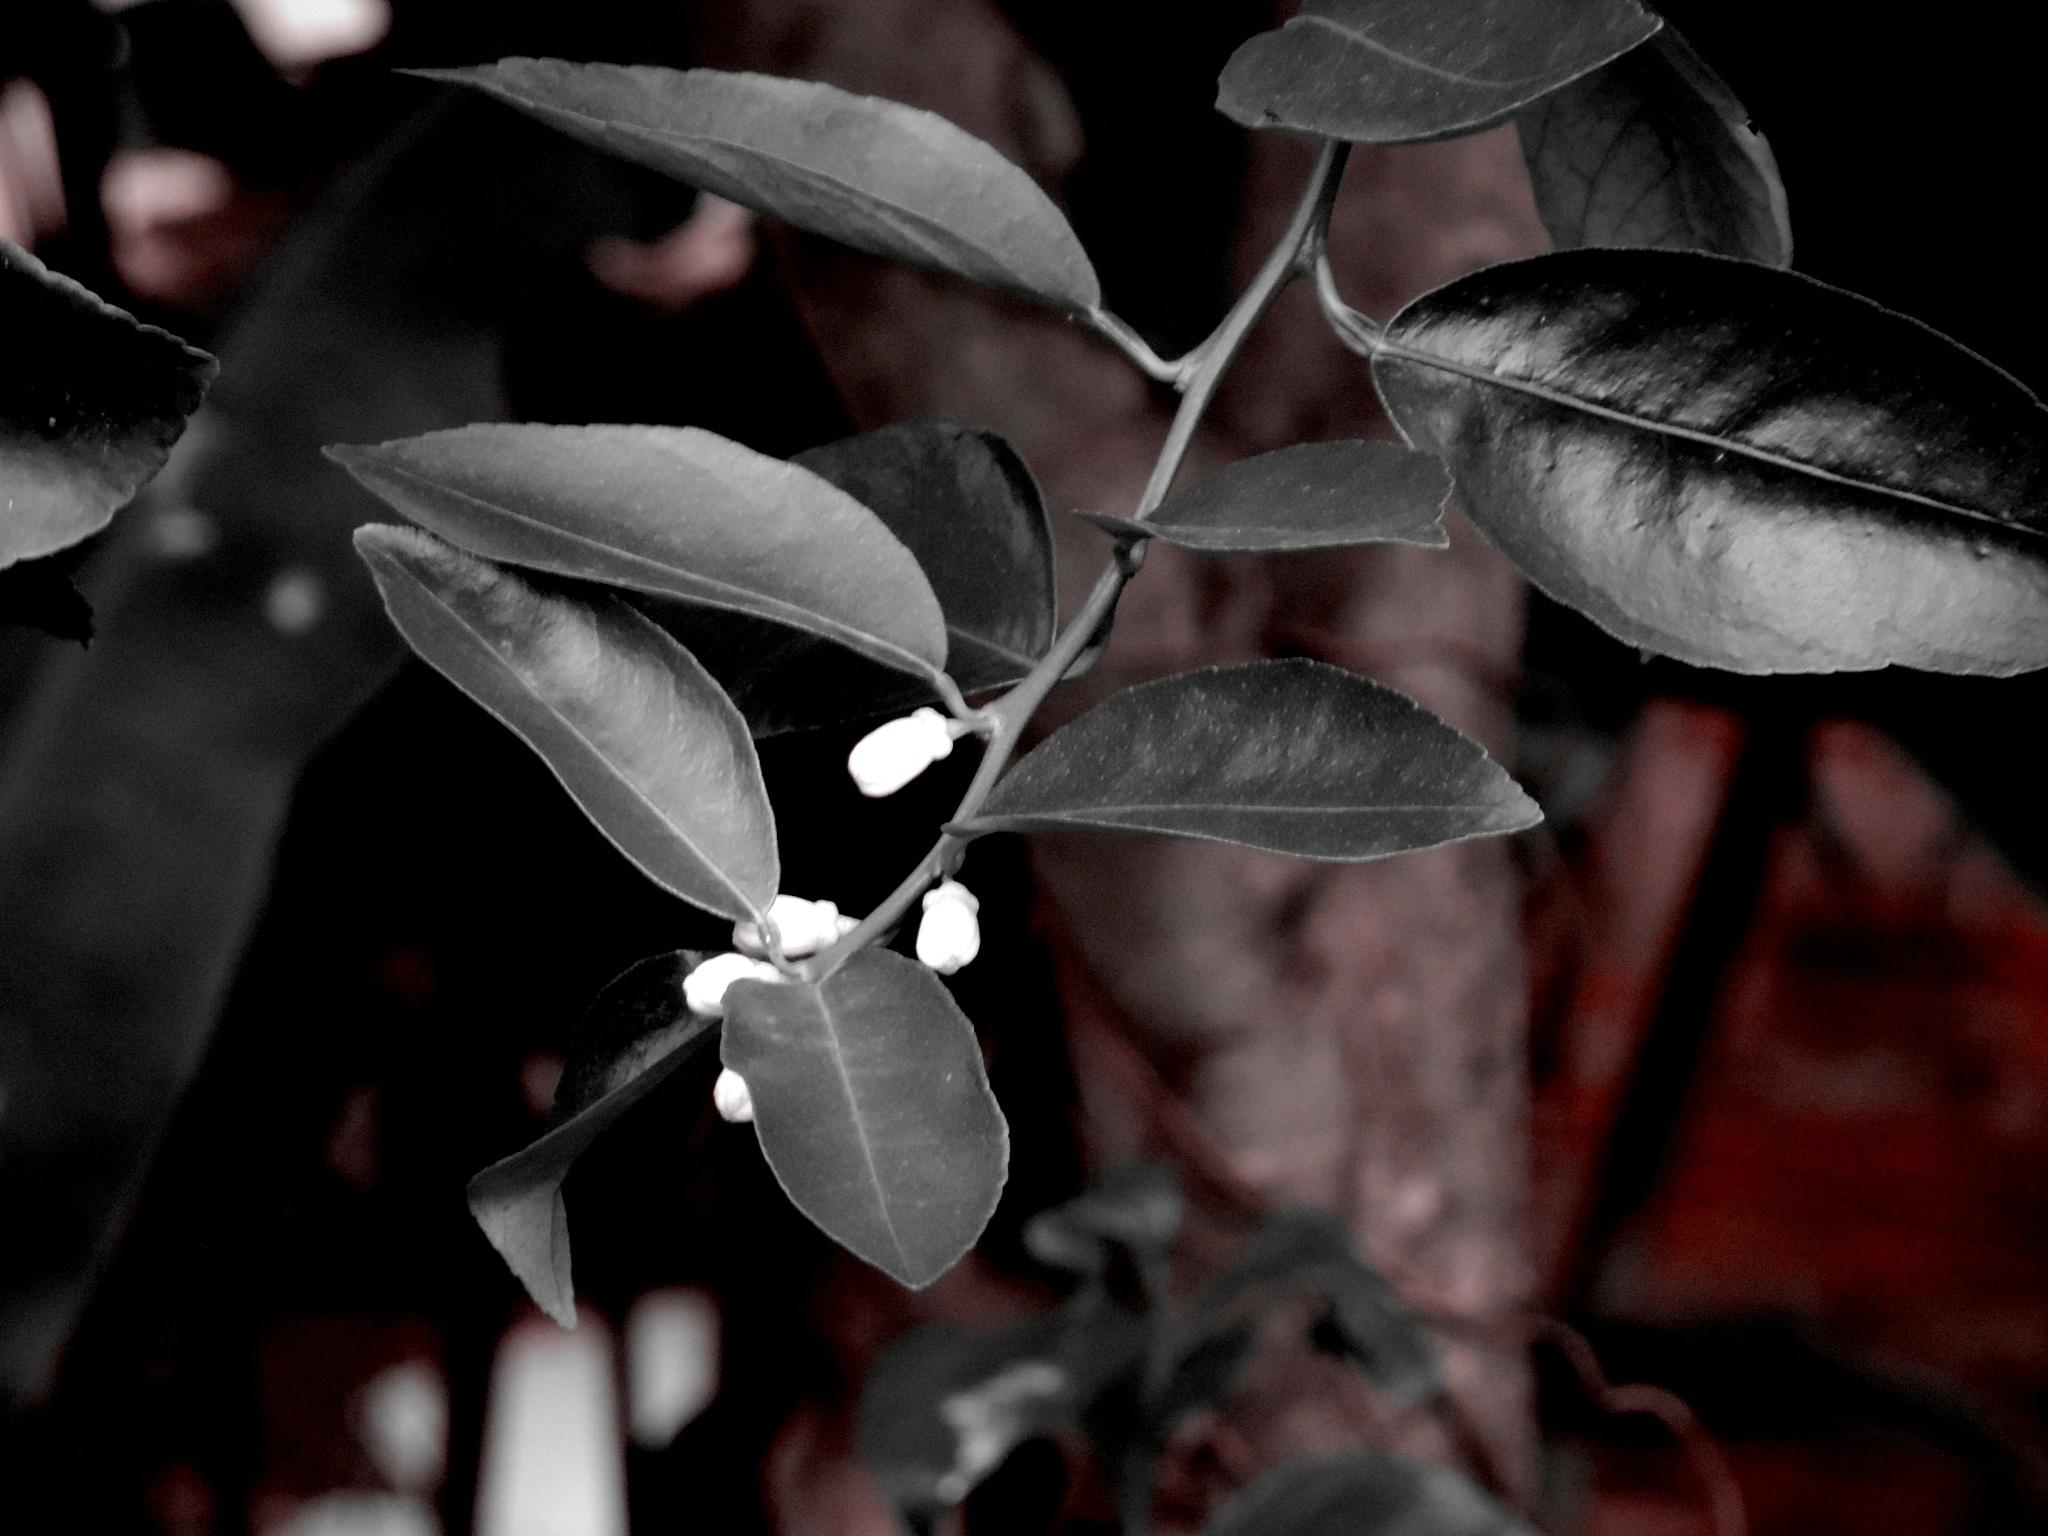 Folhas de limoeiro by Waldryano RJ